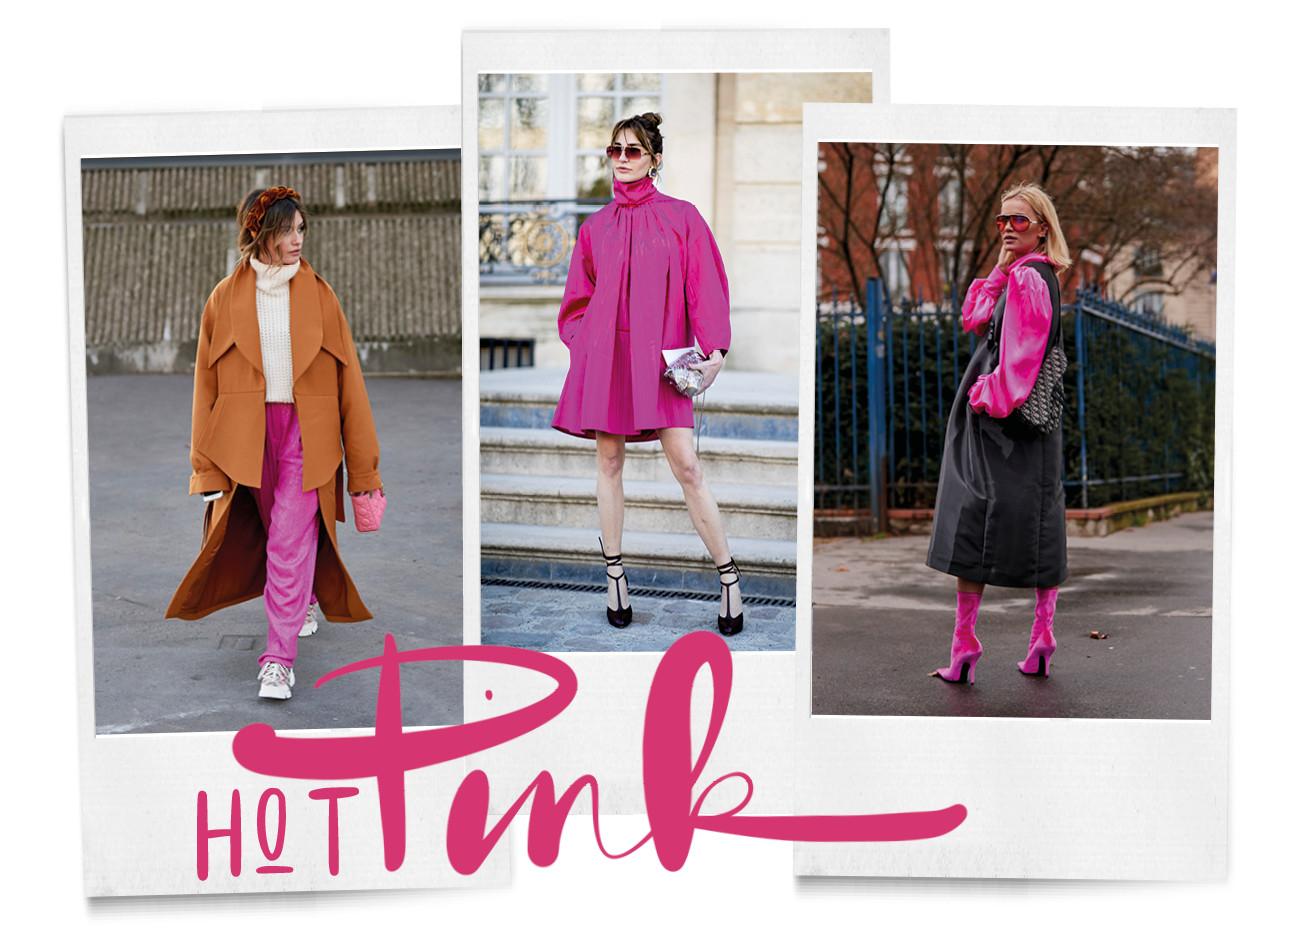 3 vrouwen in de kleur hot pink bij fashion week